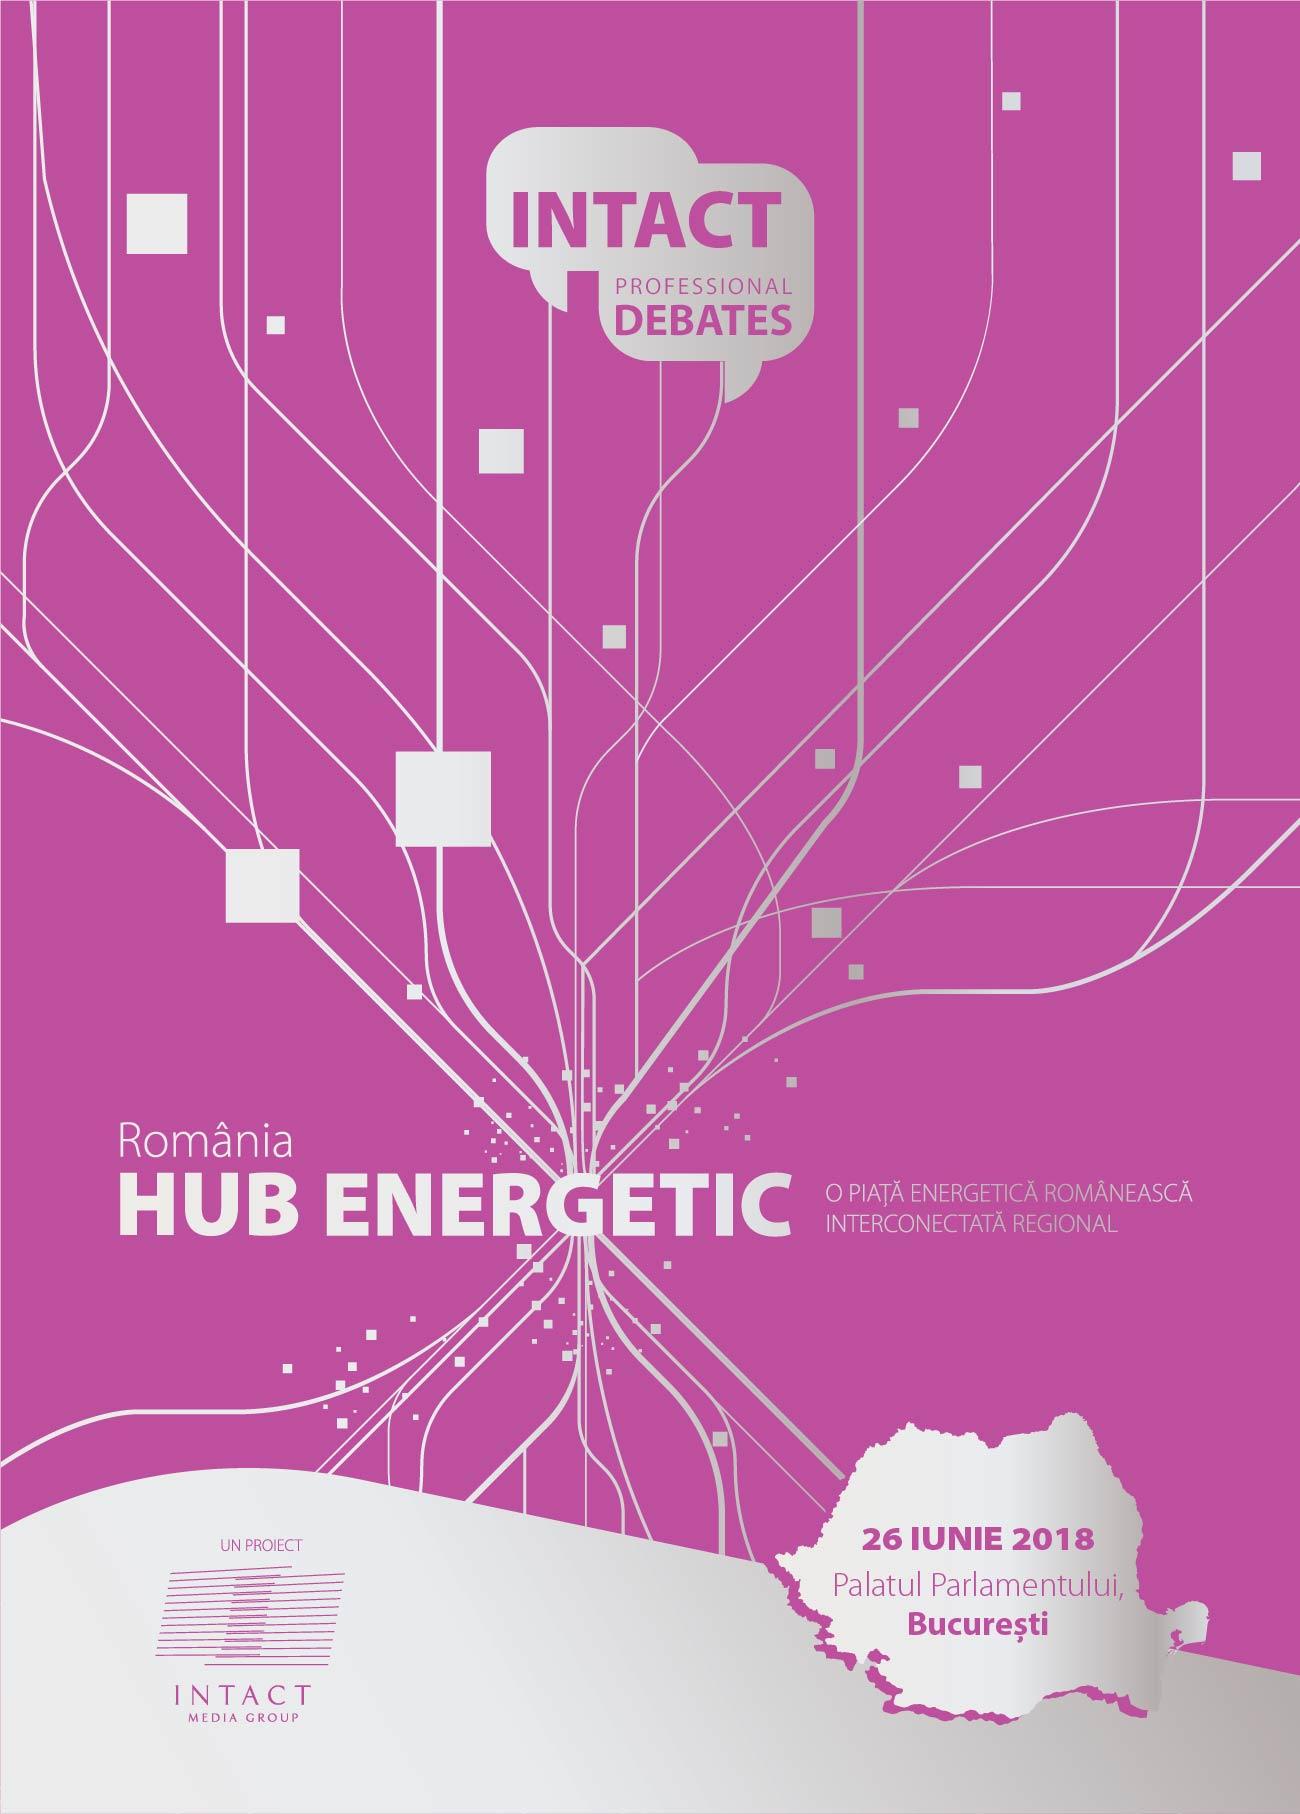 romania-hub-energetic-forum-26-iunie-2018_2